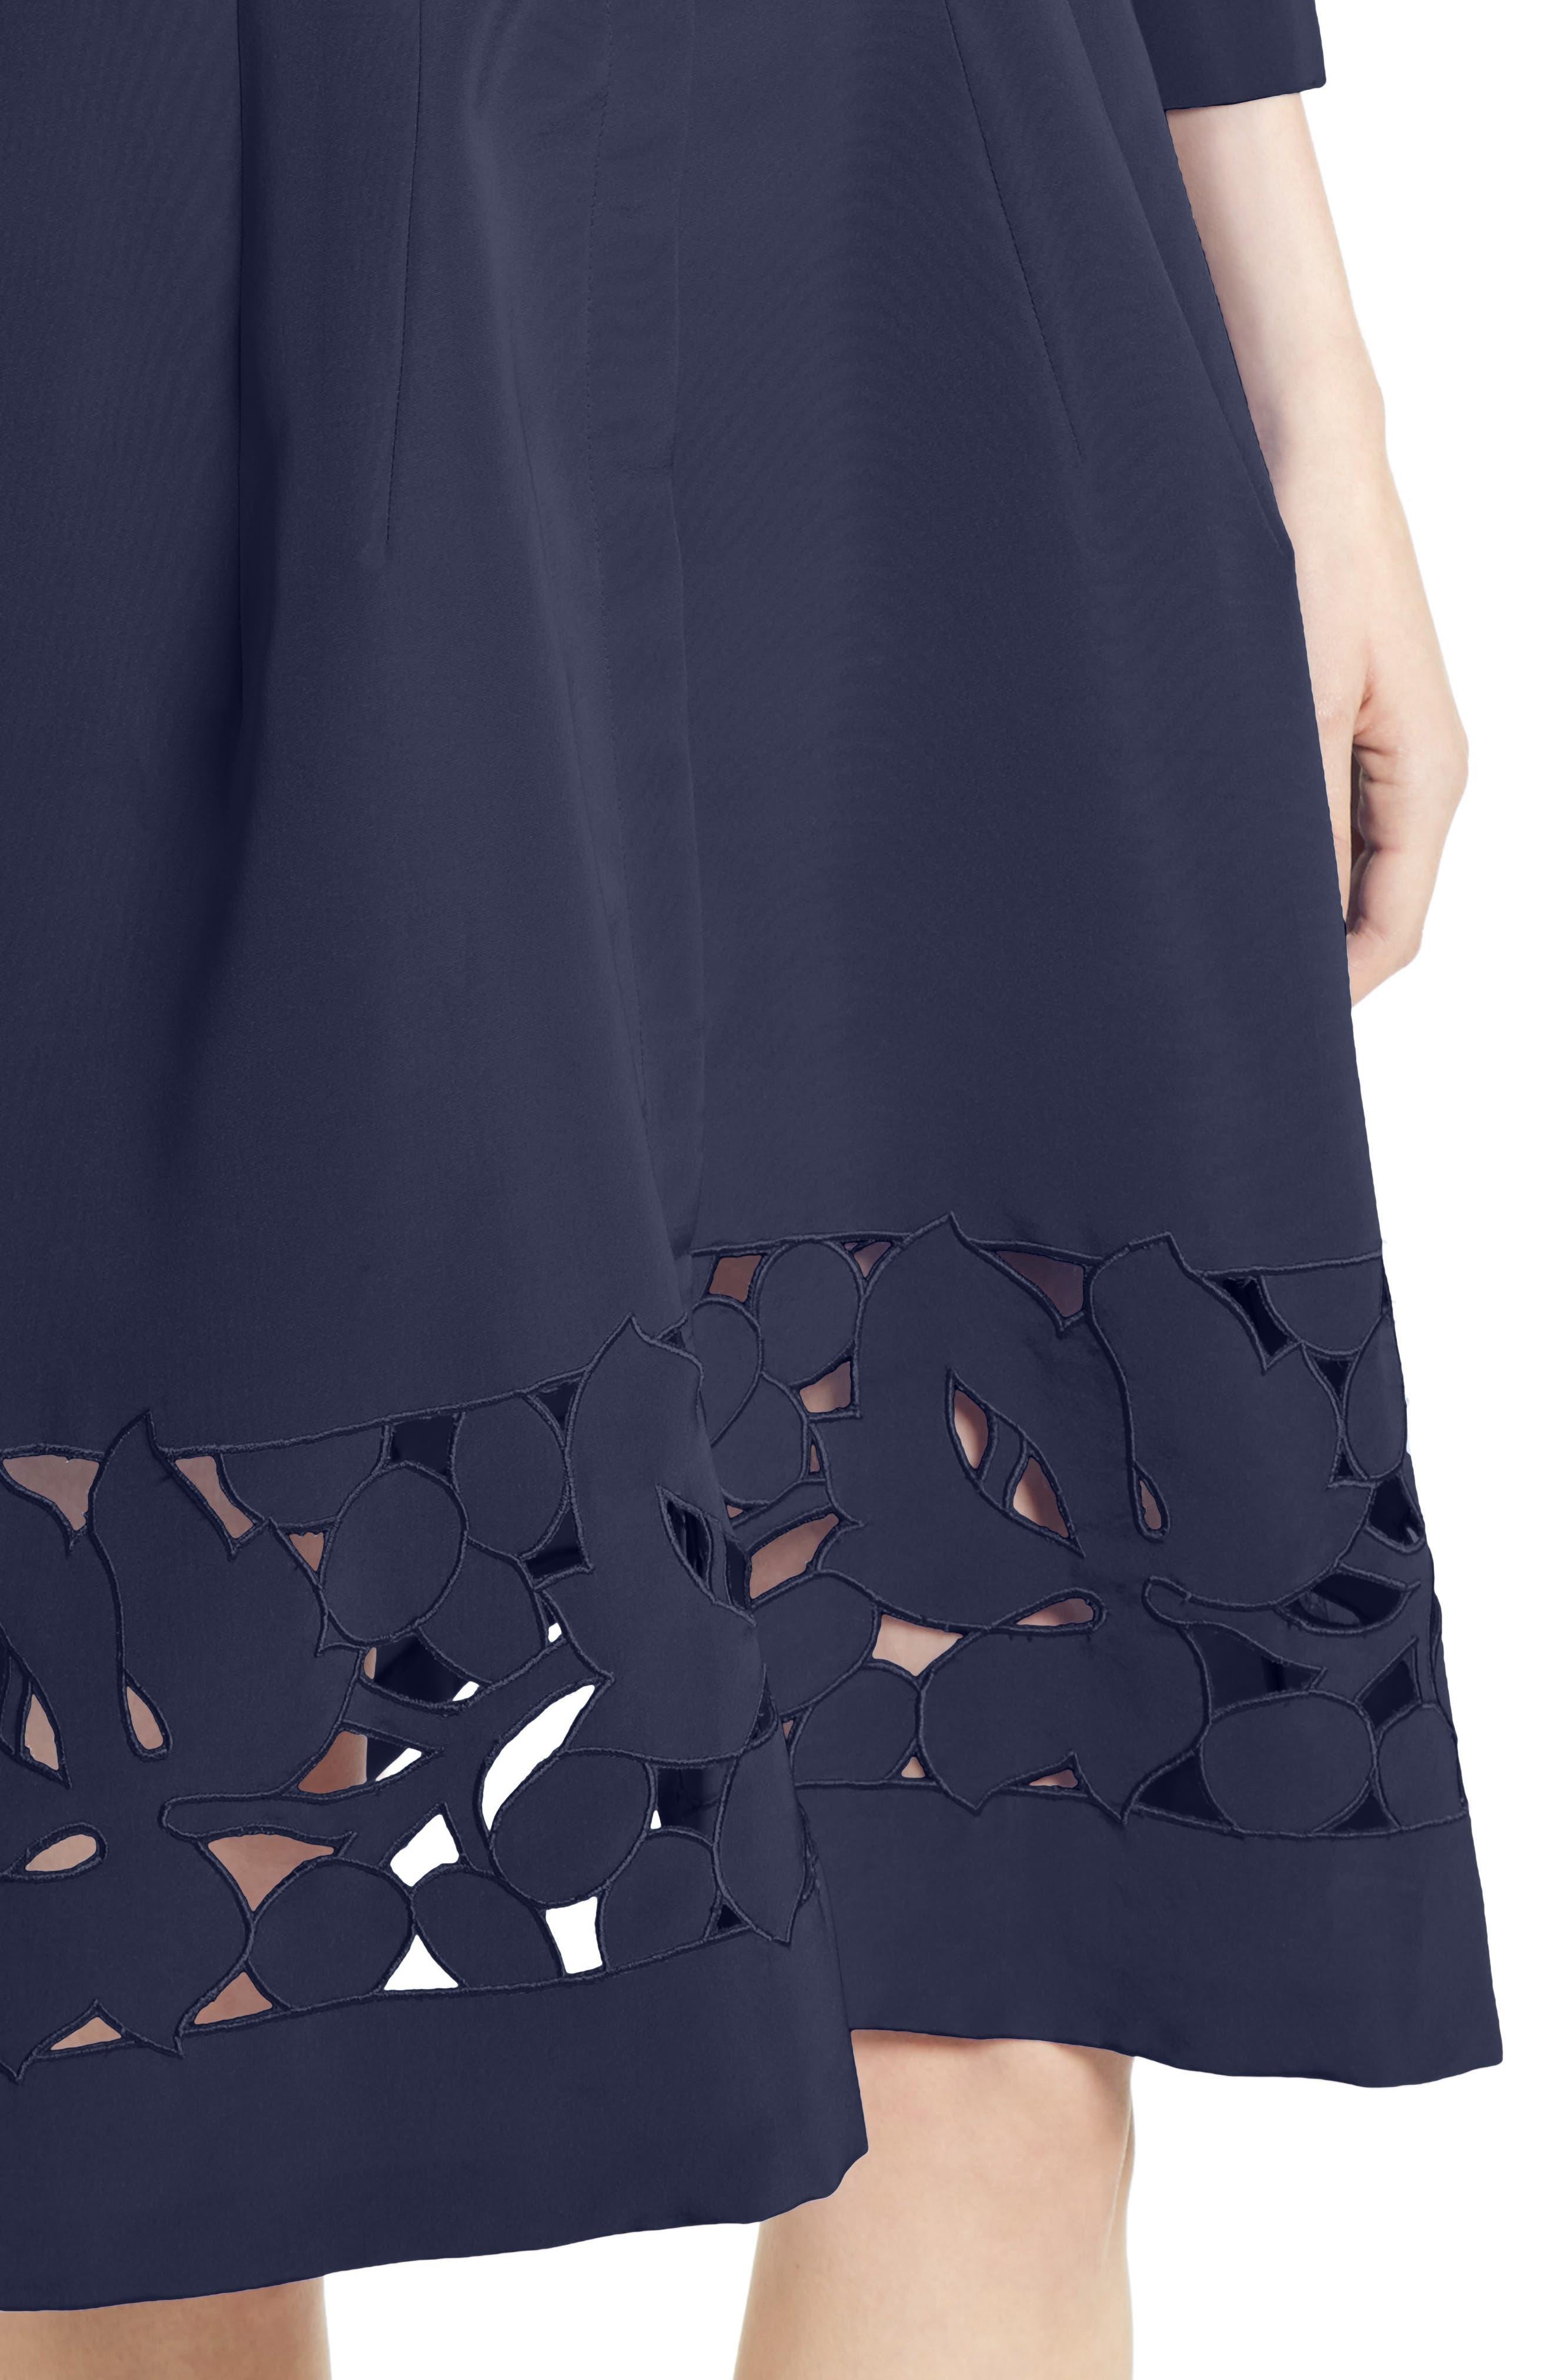 Carolina Herrerra Laser Cut Eyelet Button Front Dress,                             Alternate thumbnail 4, color,                             400